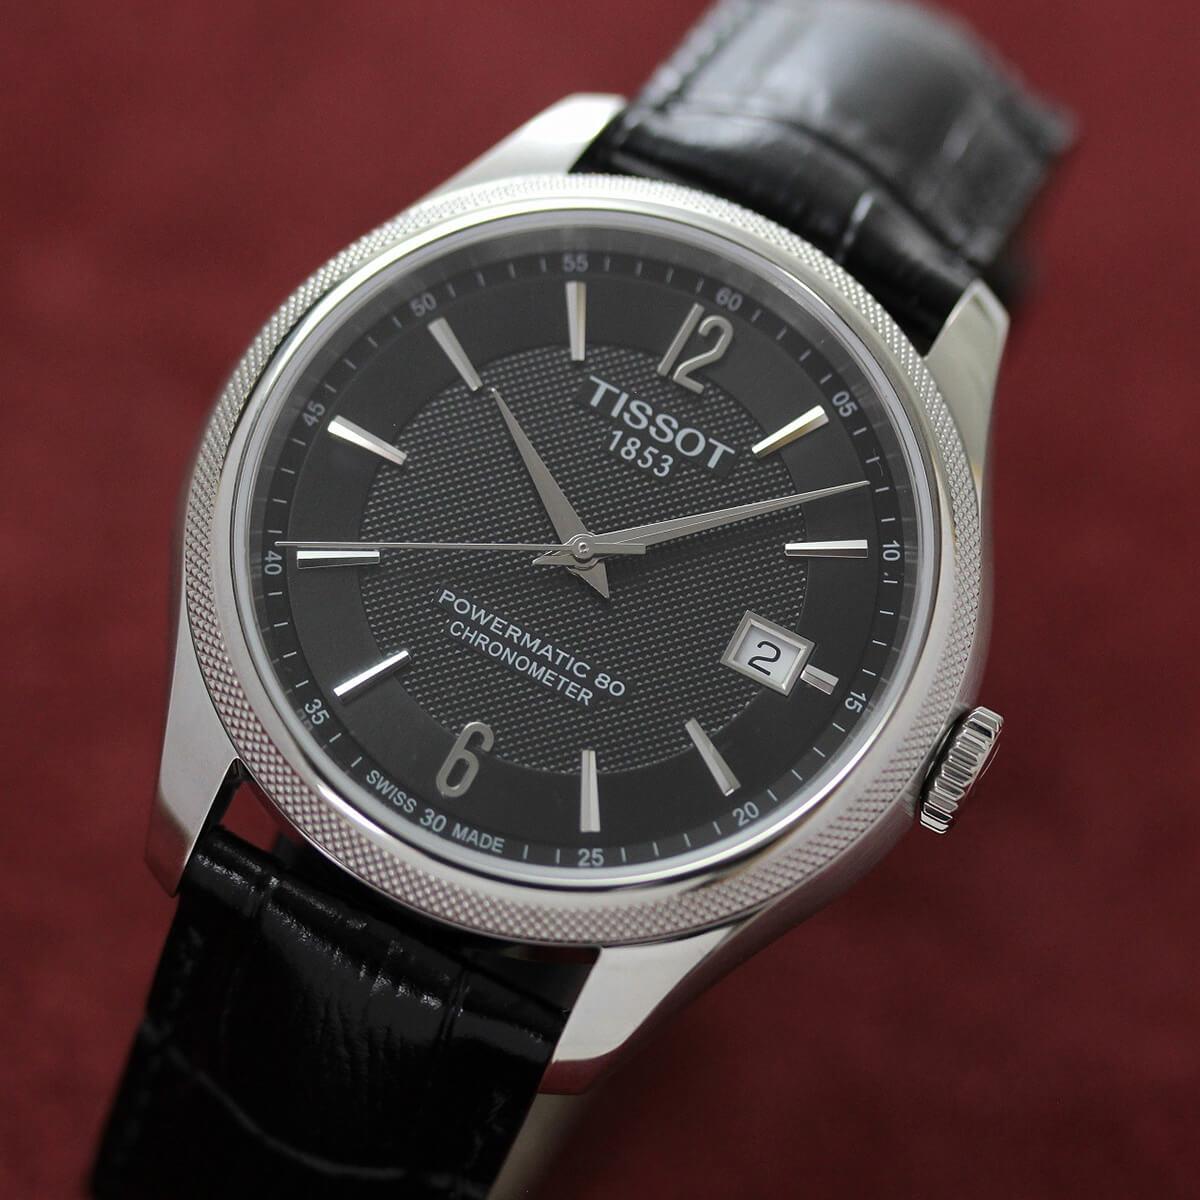 TISSOT(ティソ) Ballade Automatic (バラード オートマティック)腕時計 t1084081605700